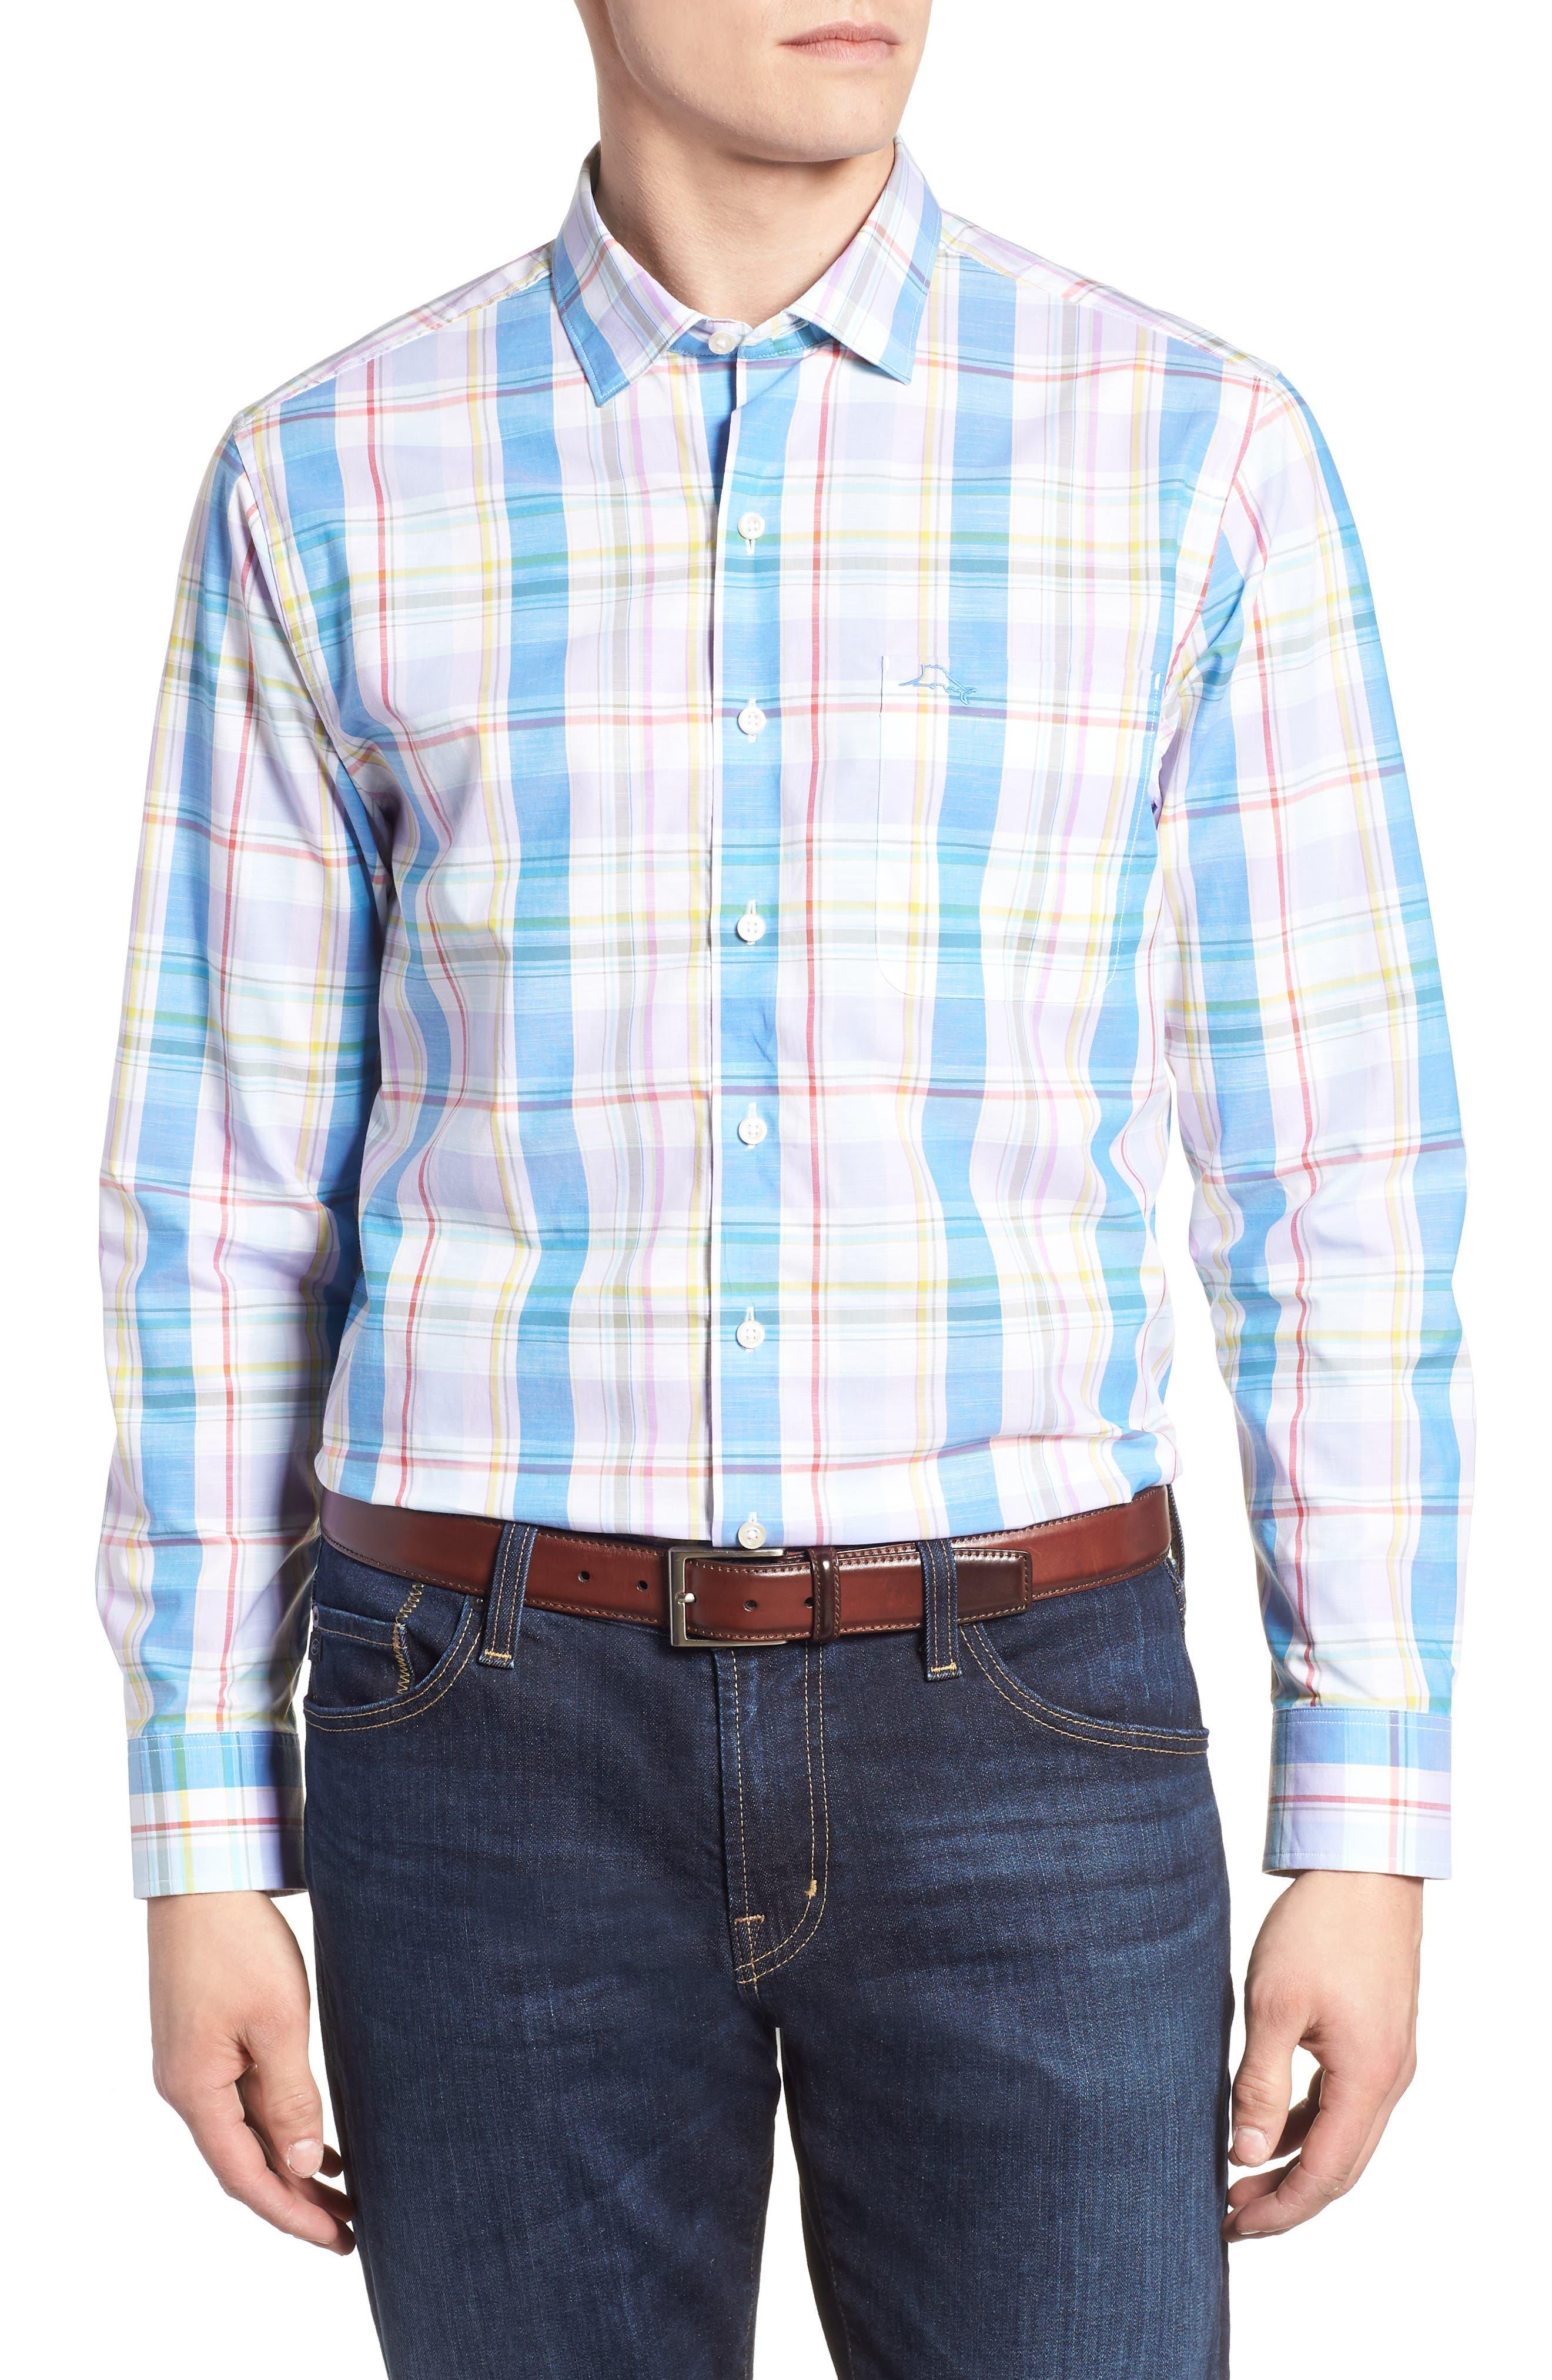 Privada Plaid Sport Shirt,                             Main thumbnail 1, color,                             400